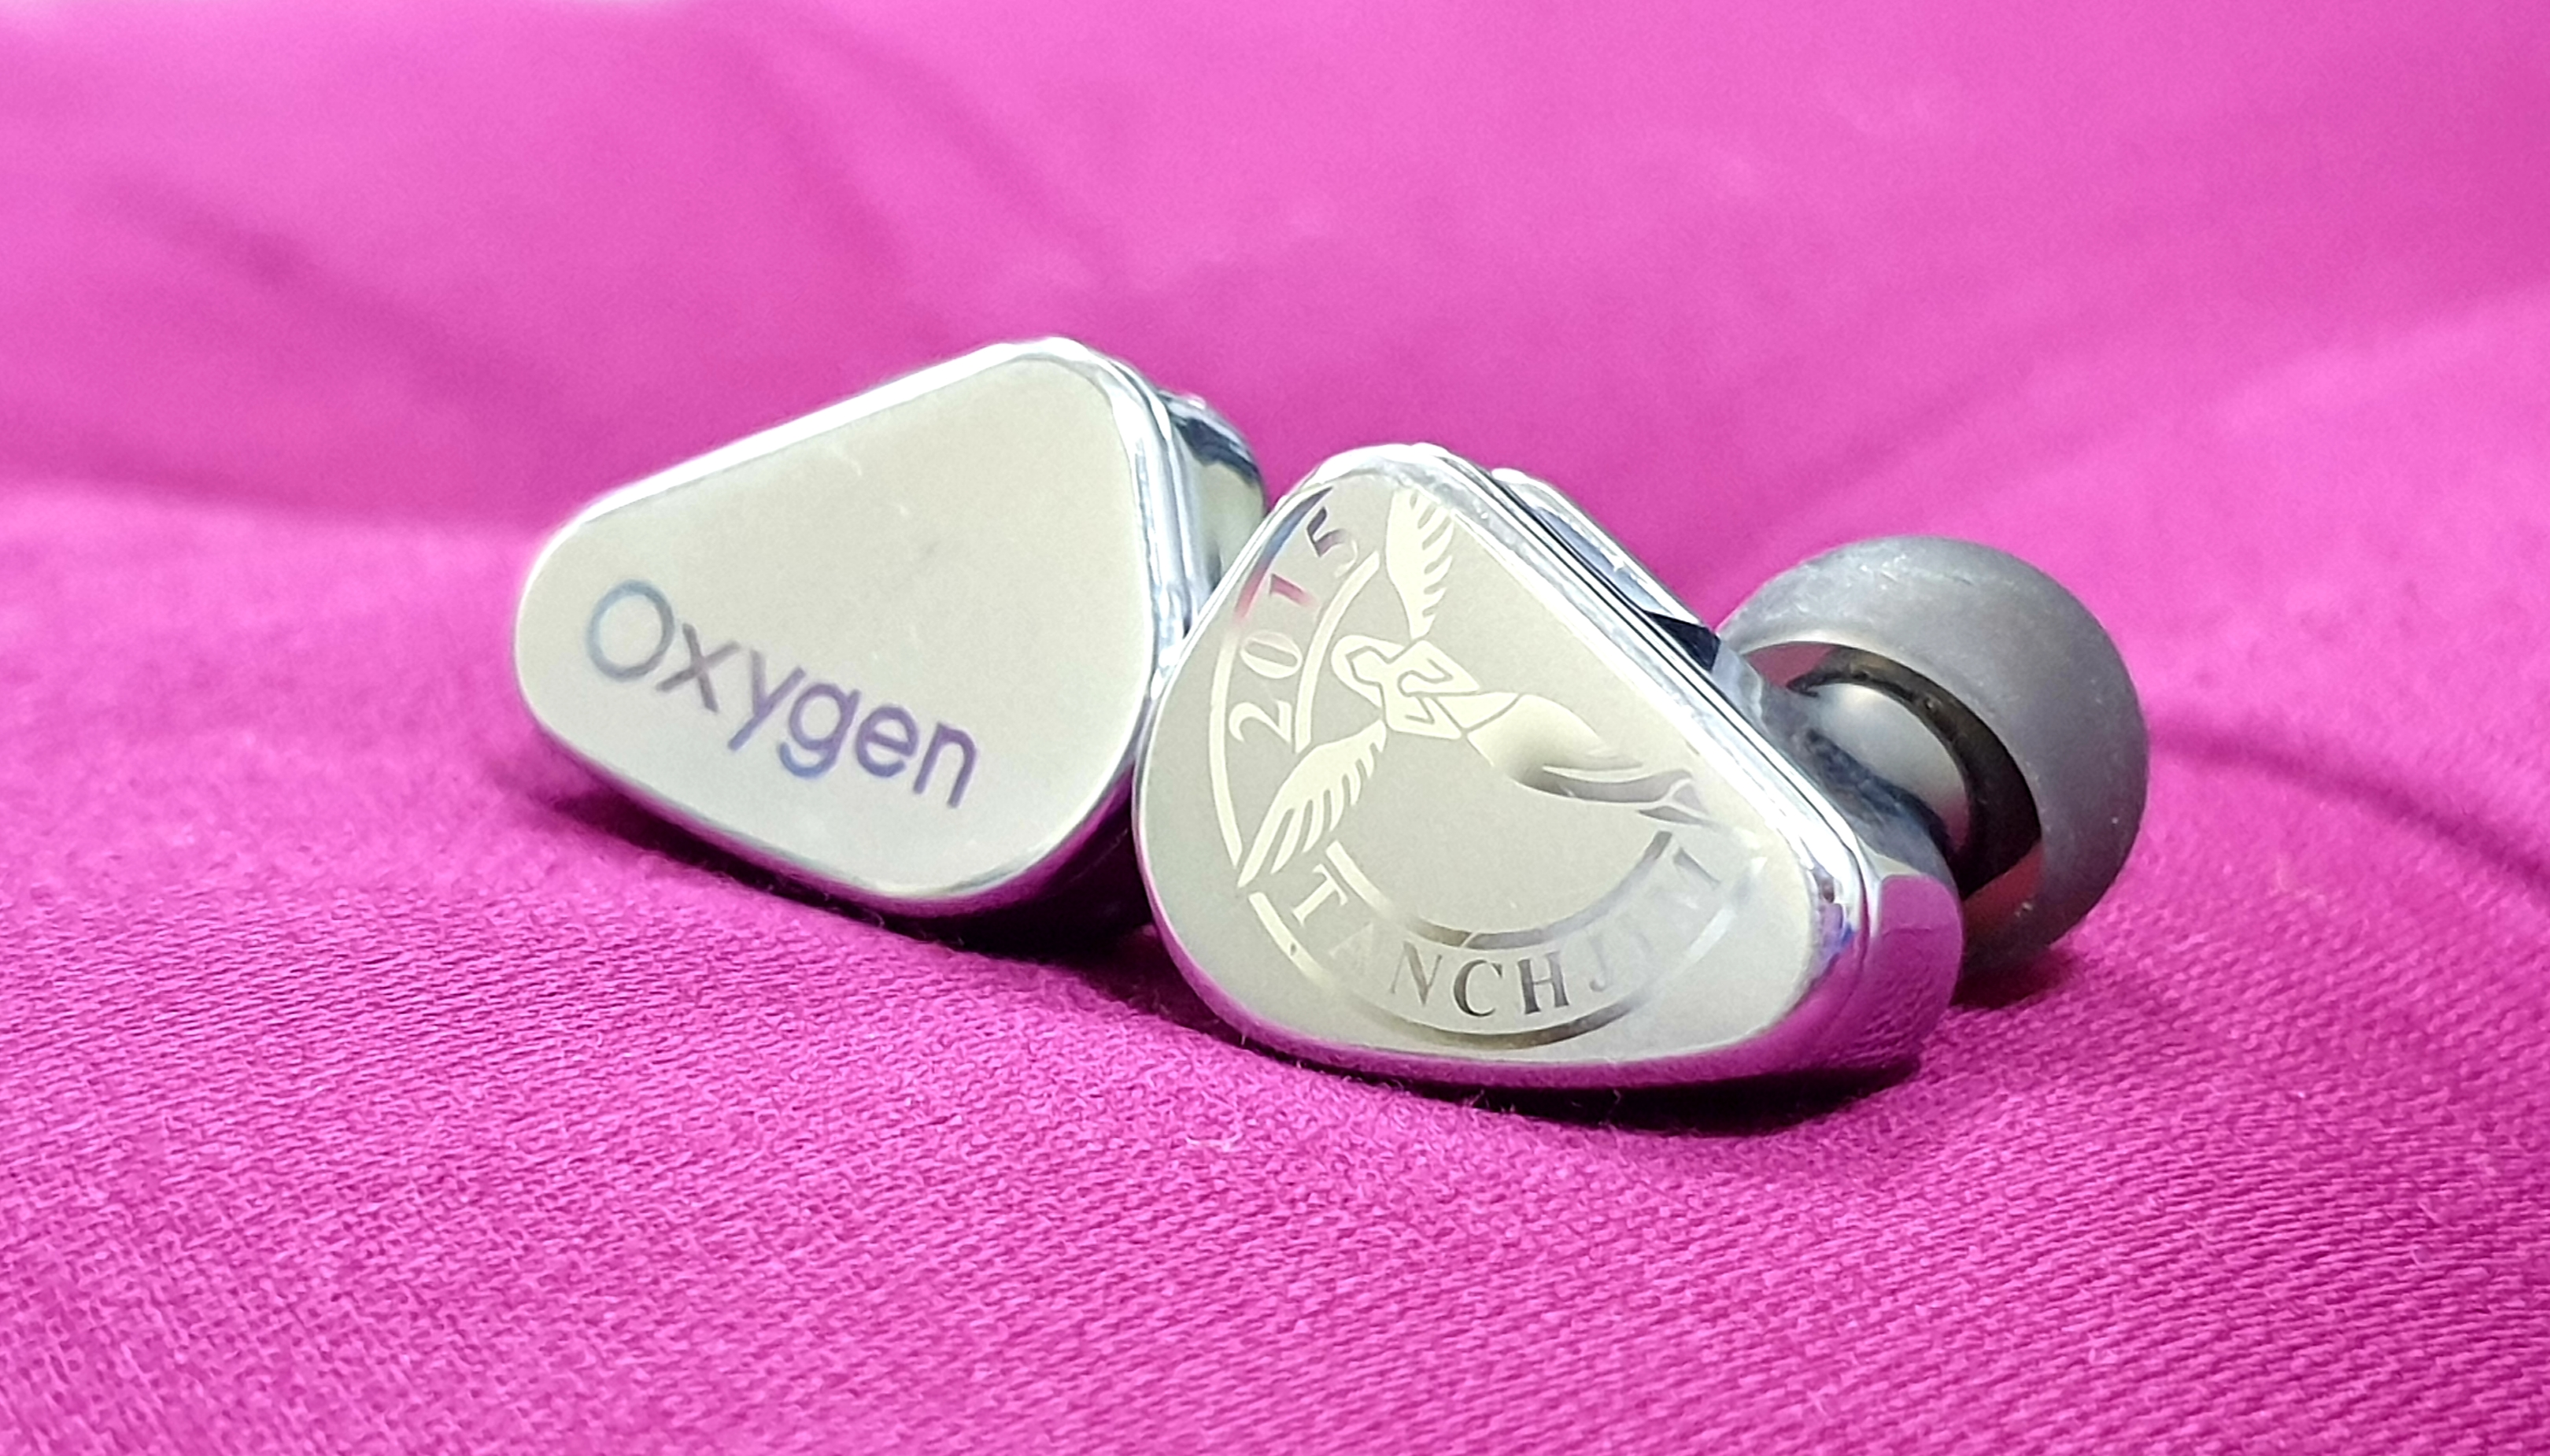 Oxygen-03.jpg